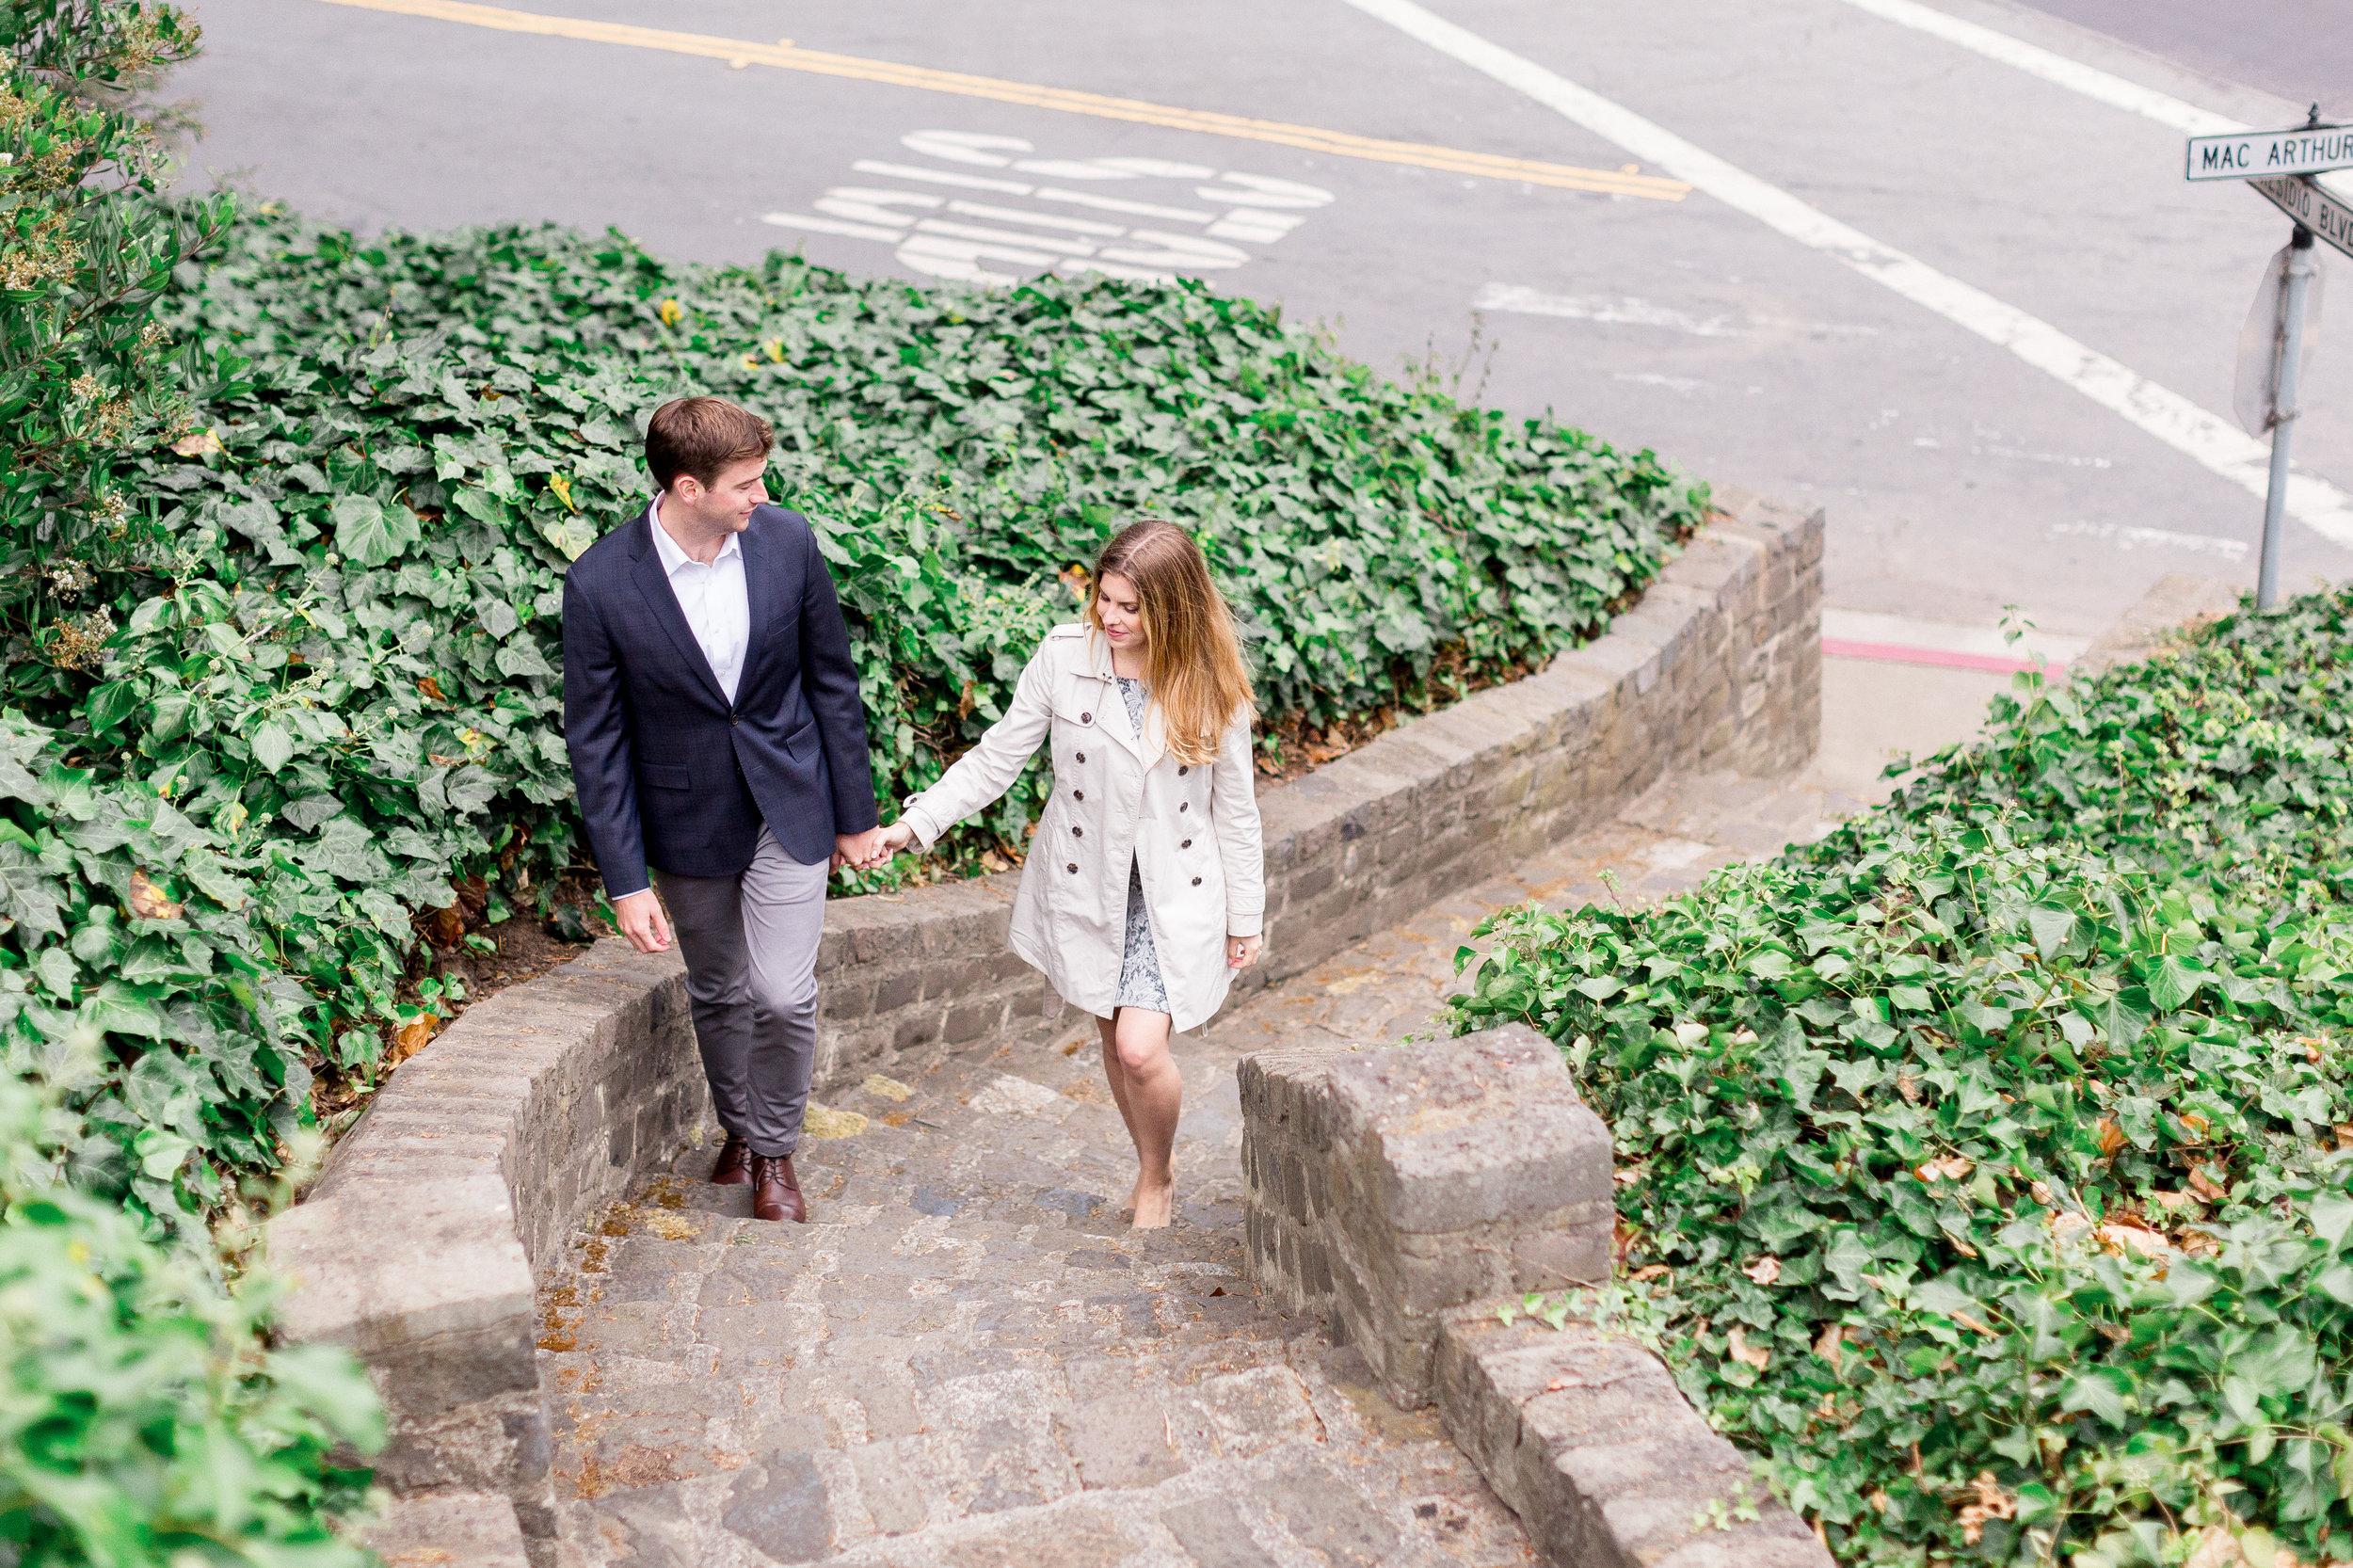 Lovers-Lane-San-Francisco-Engagement-Photos-78.jpg